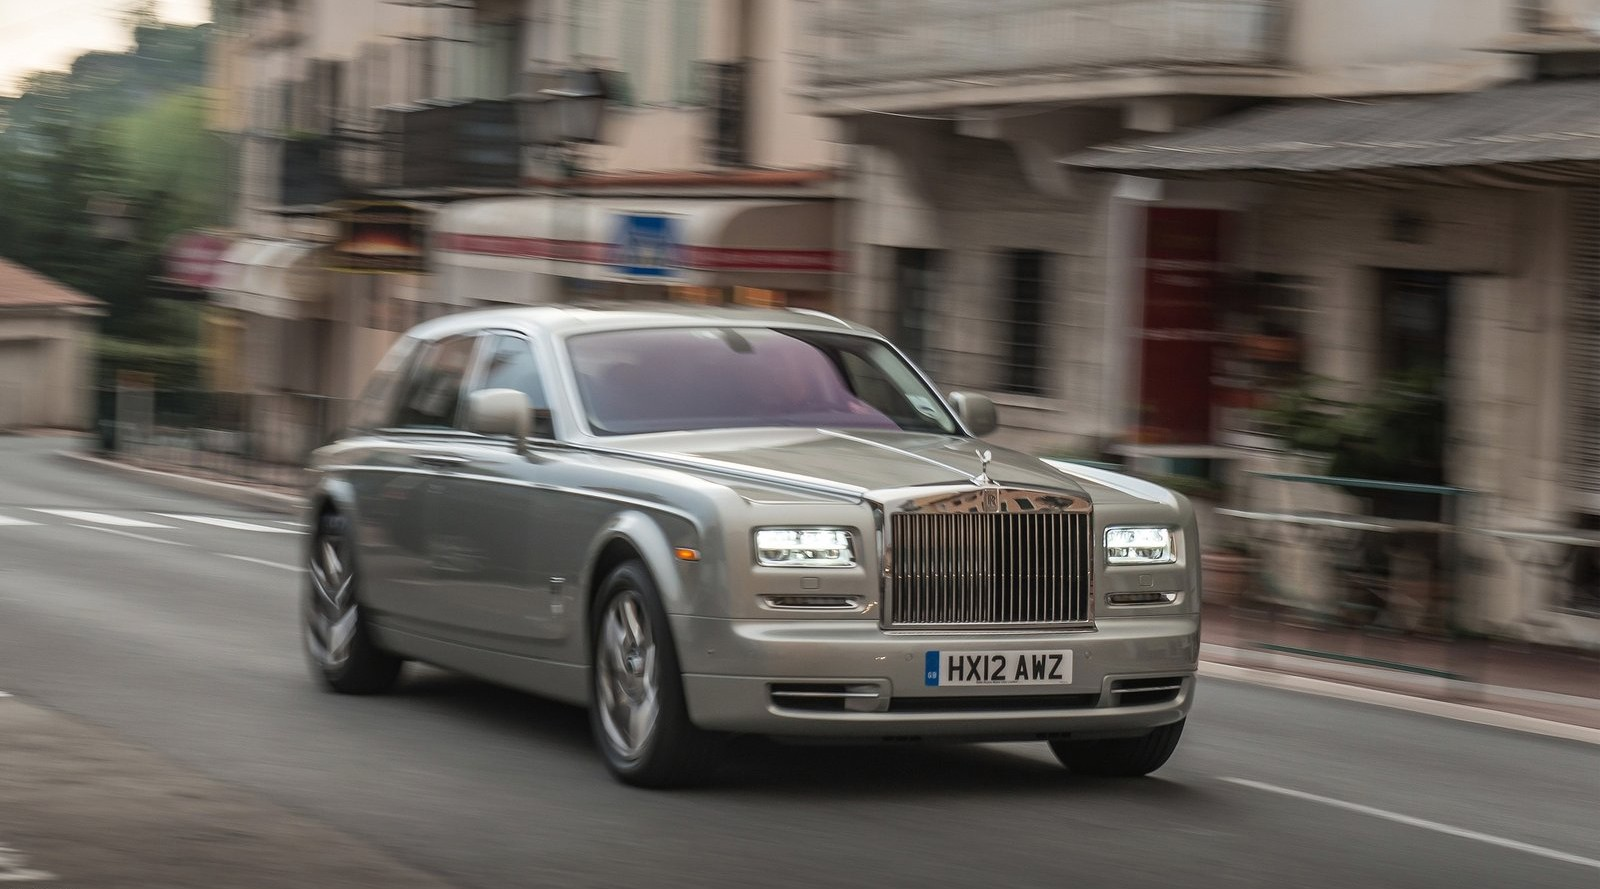 Передняя сторона Rolls-Royce Phantom